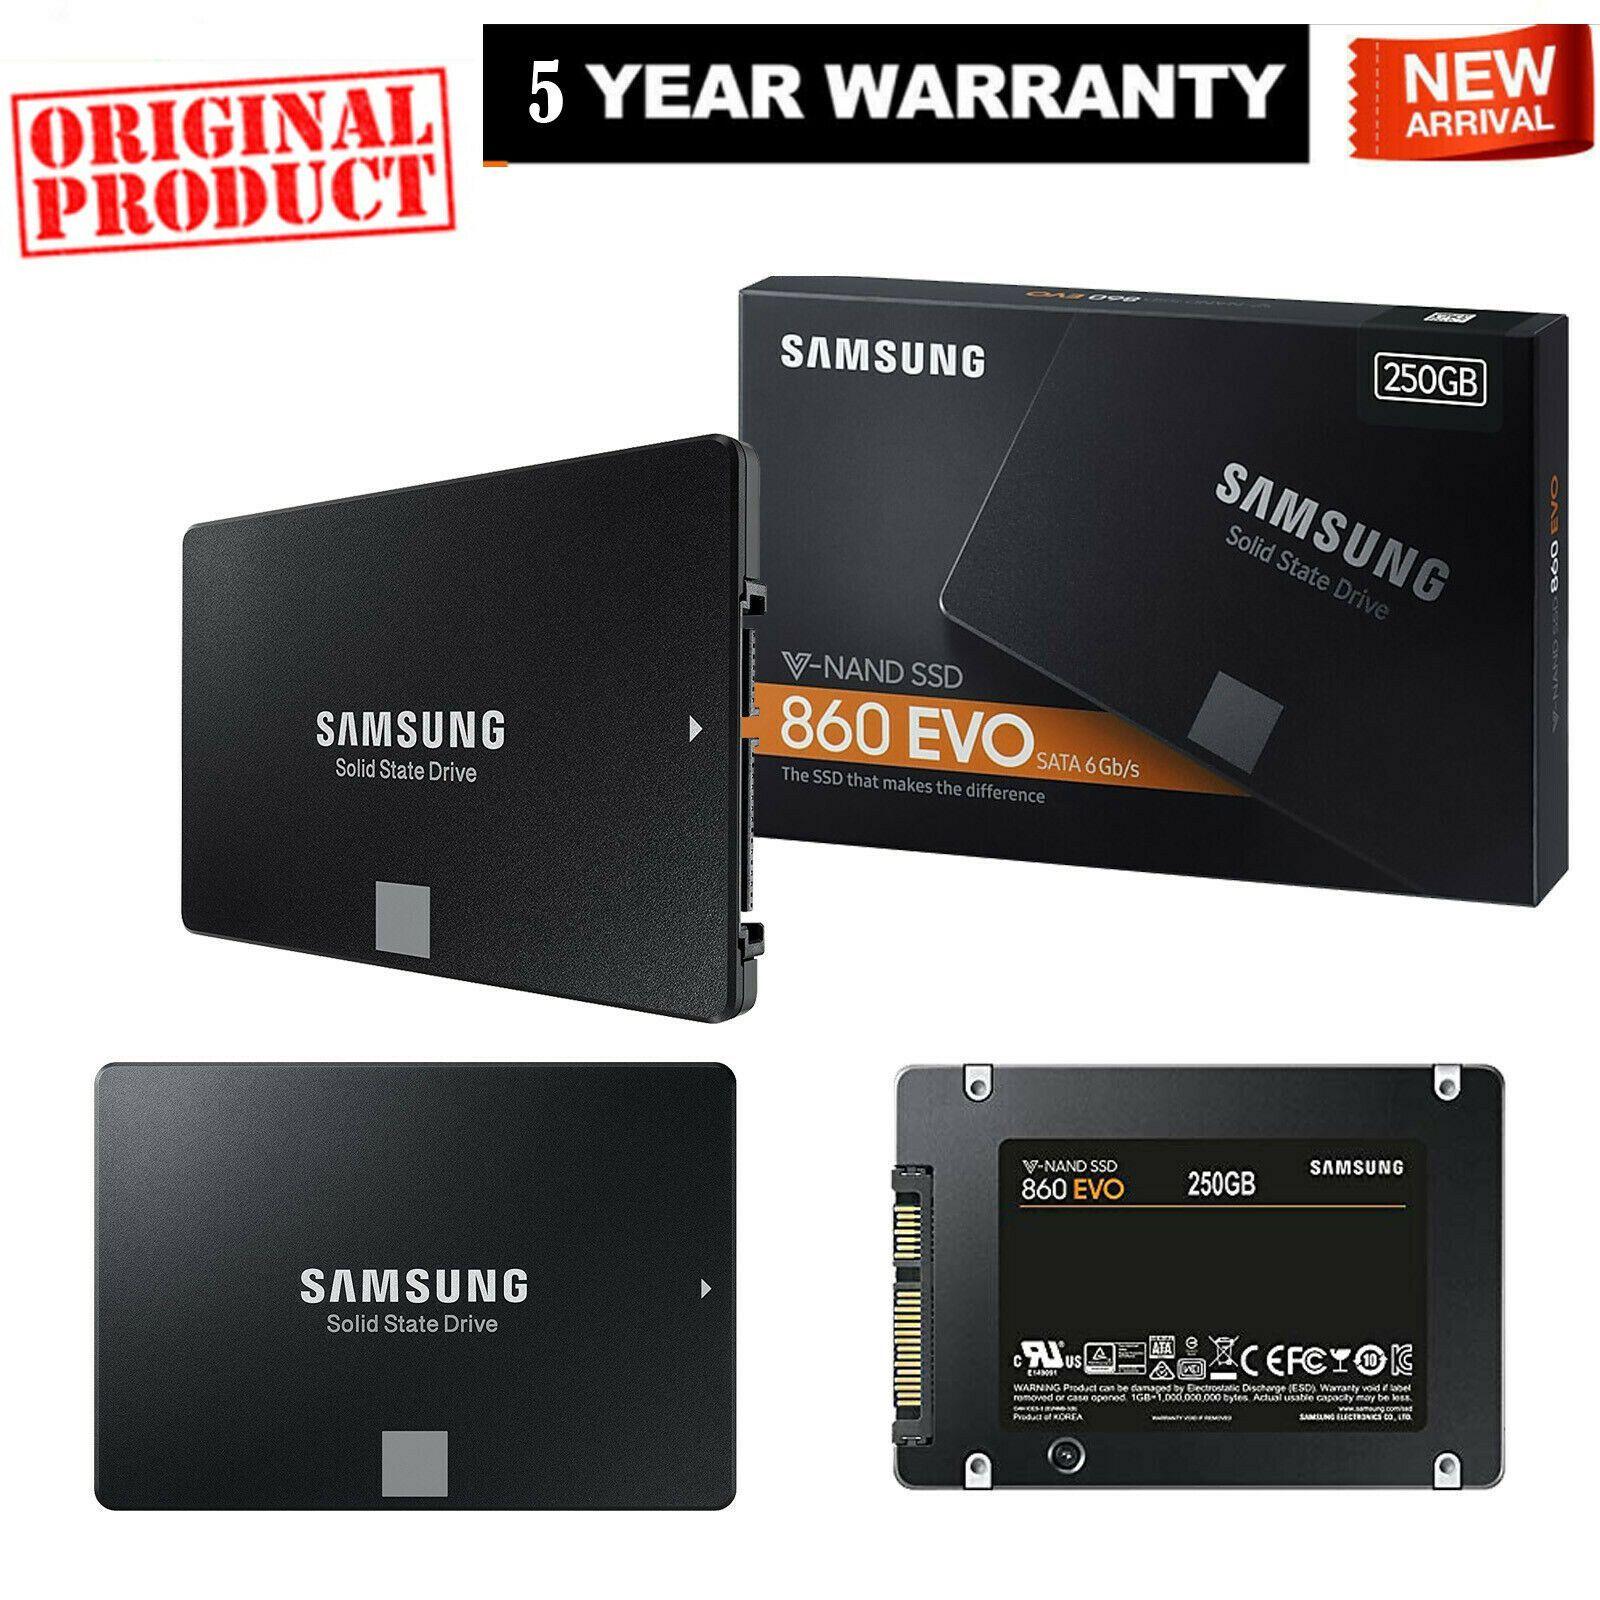 "SAMSUNG 250GB 2.5"" 860 EVO SSD INTERNAL SATA III SSD (With"